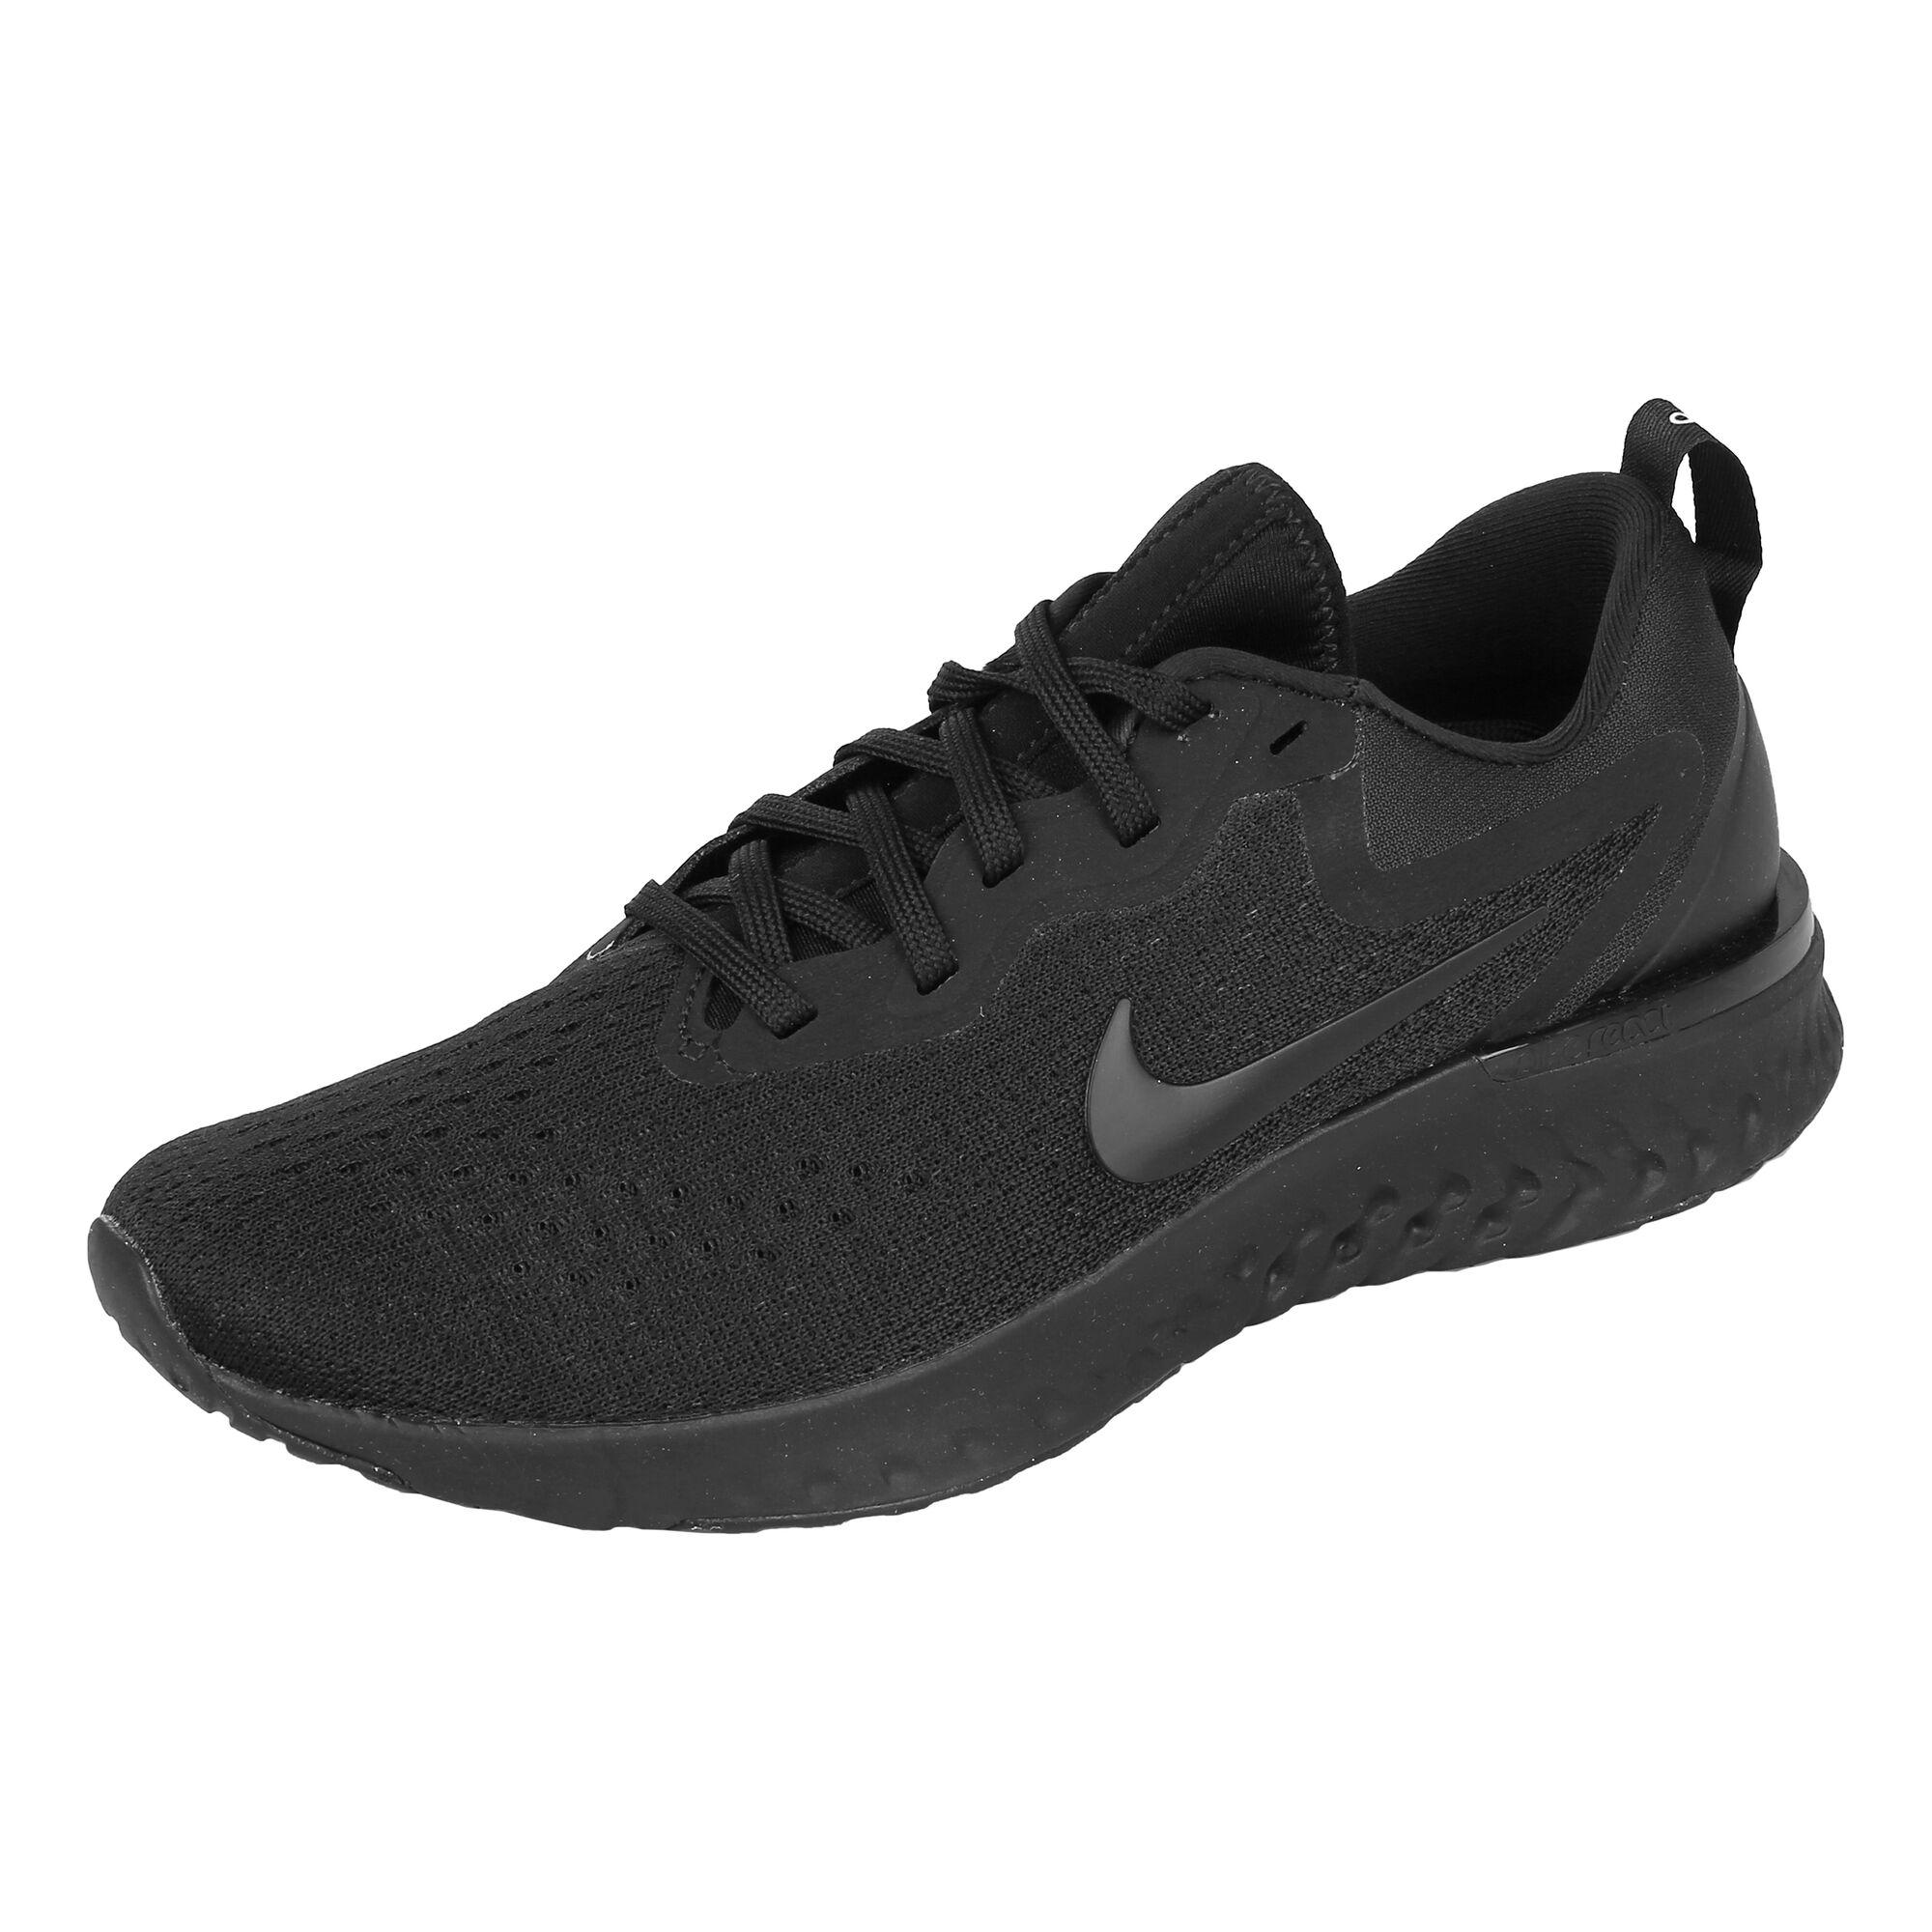 official photos 7e4e4 87e5c buy Nike Glide React Neutral Running Shoe Women - Black onli